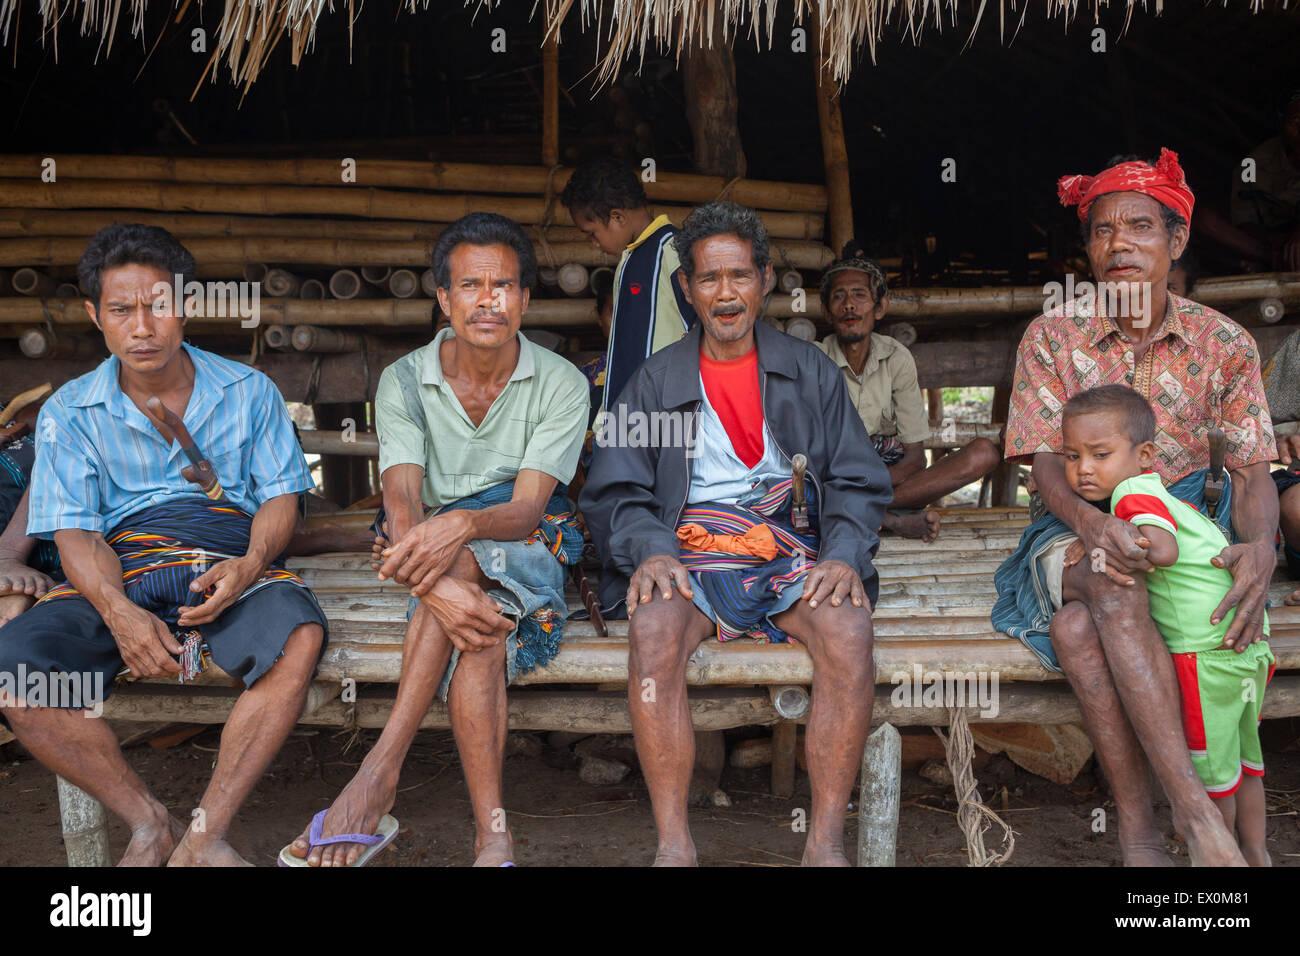 Portraits of local people in Sumba Island, Indonesia. - Stock Image